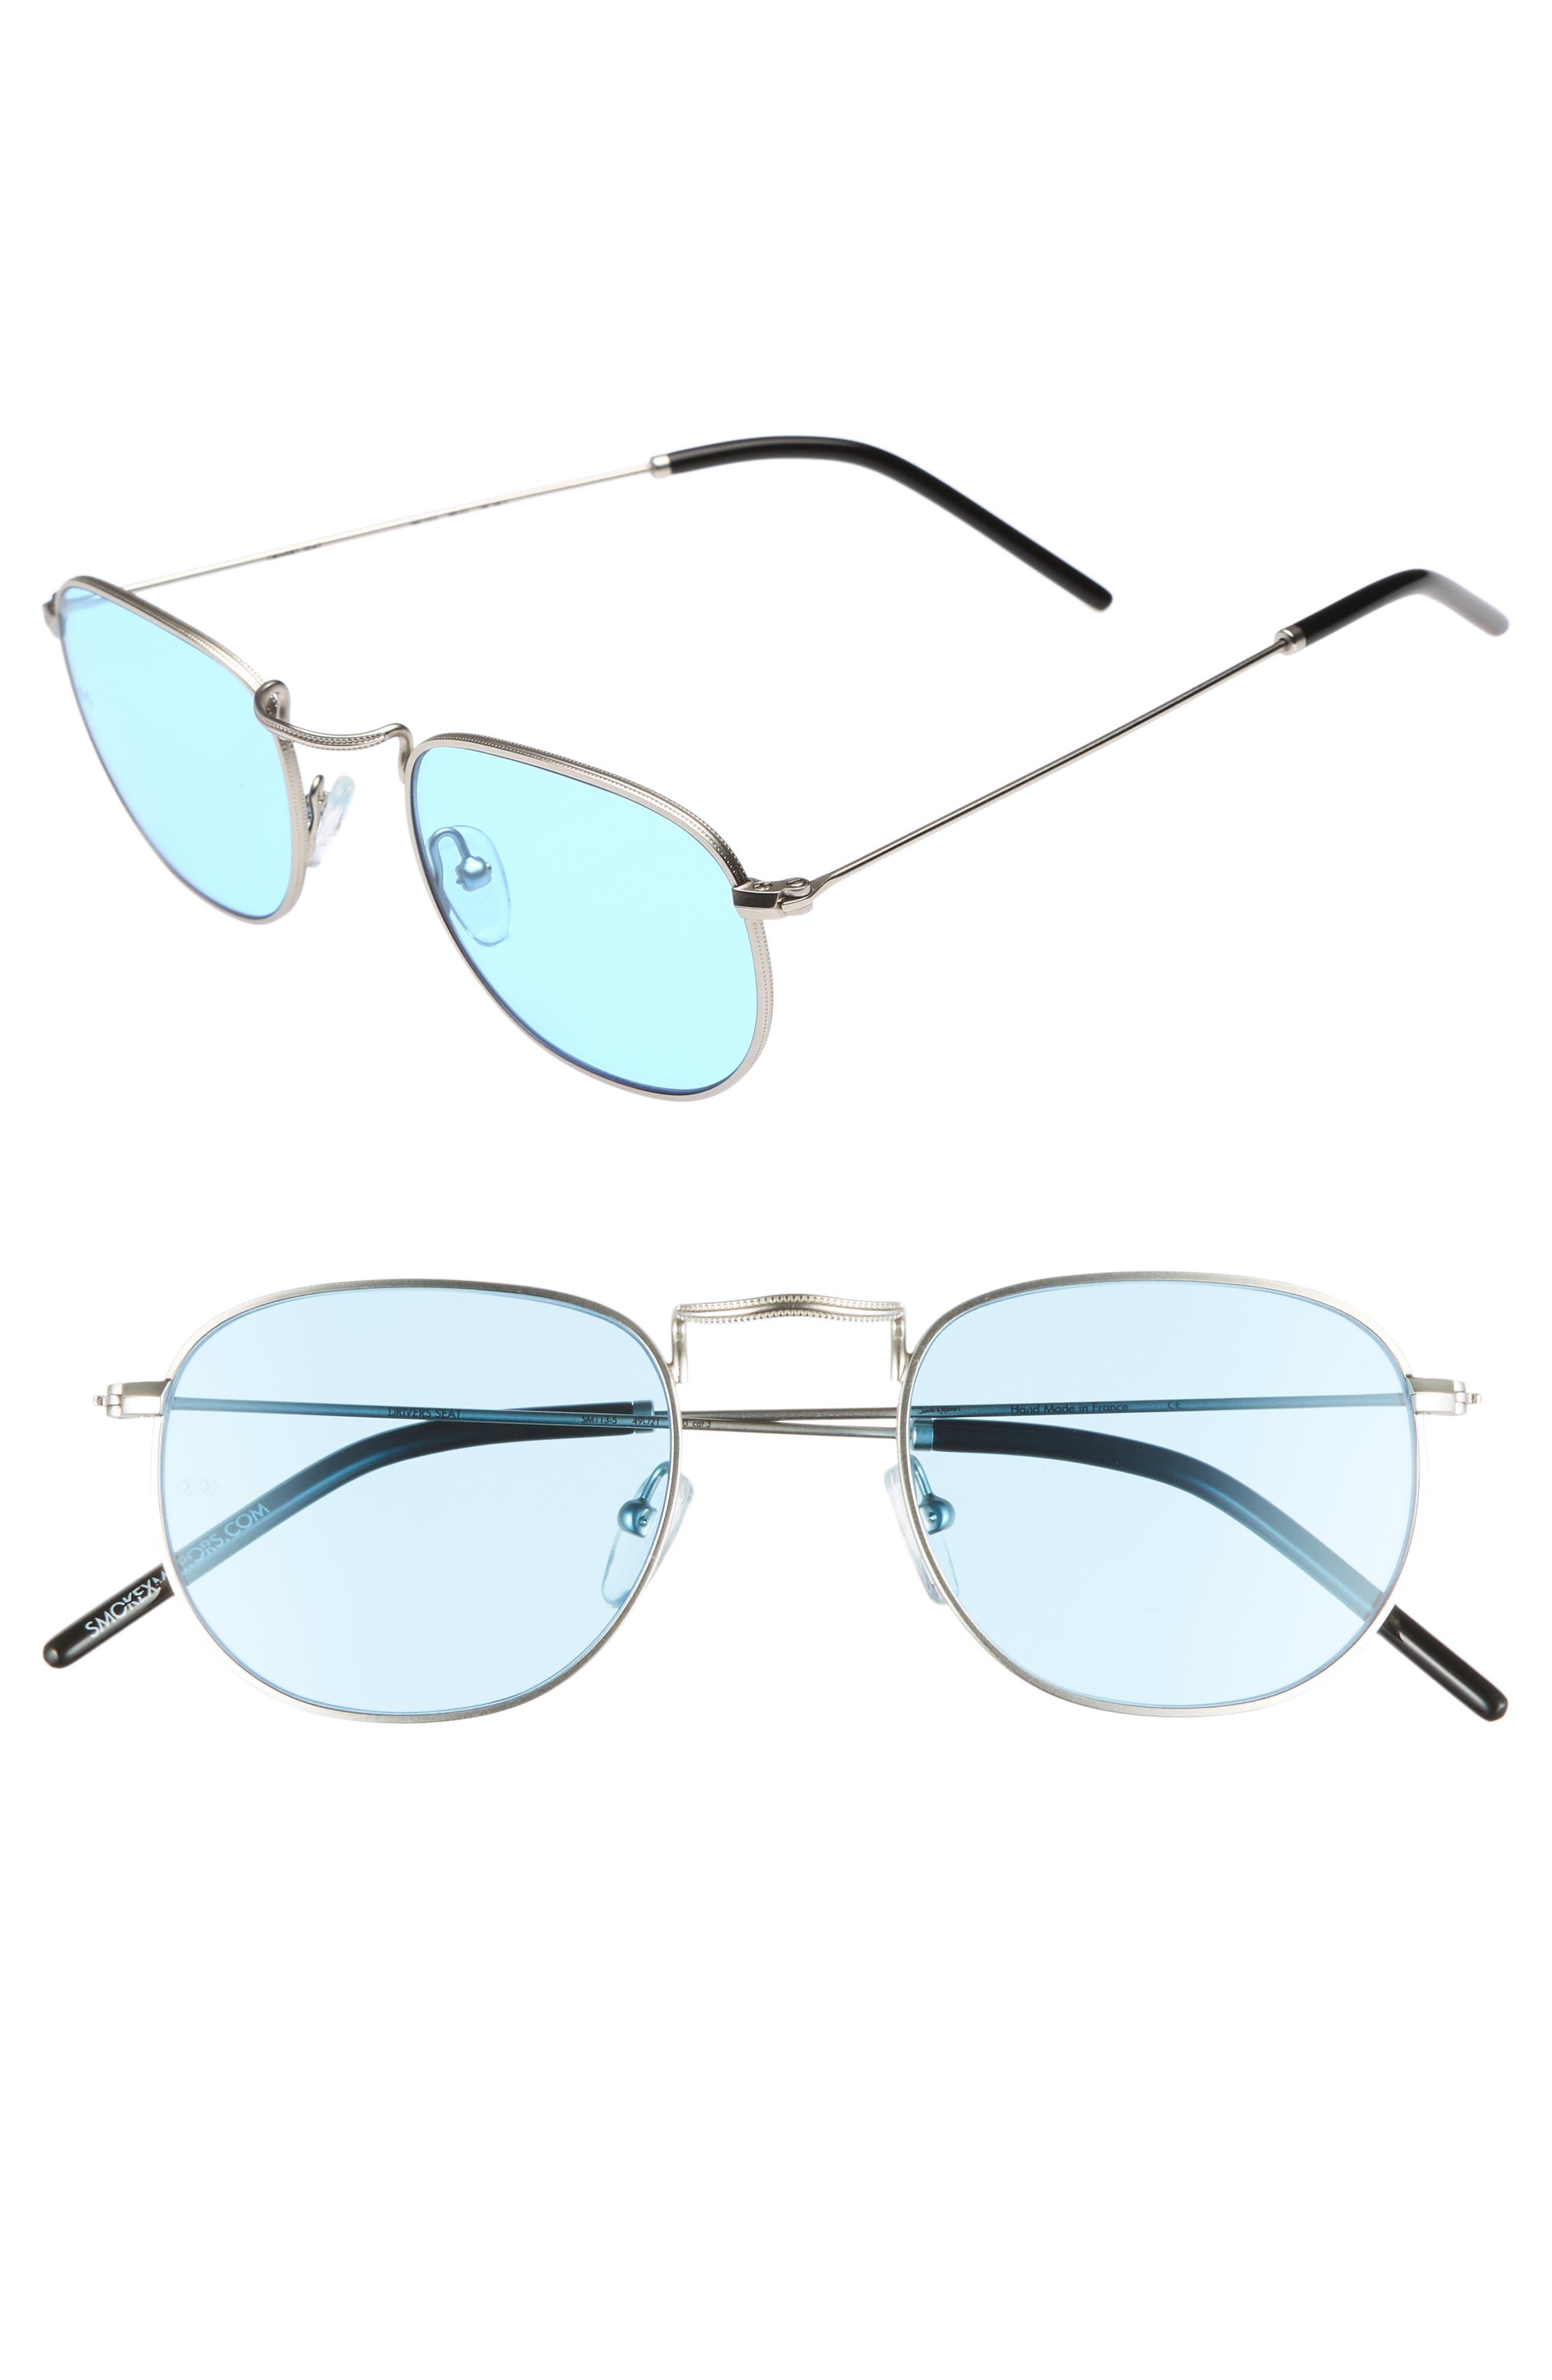 Smoke X Mirrors Men's Driver's Seat 49Mm Sunglasses - / 2yauVX2J